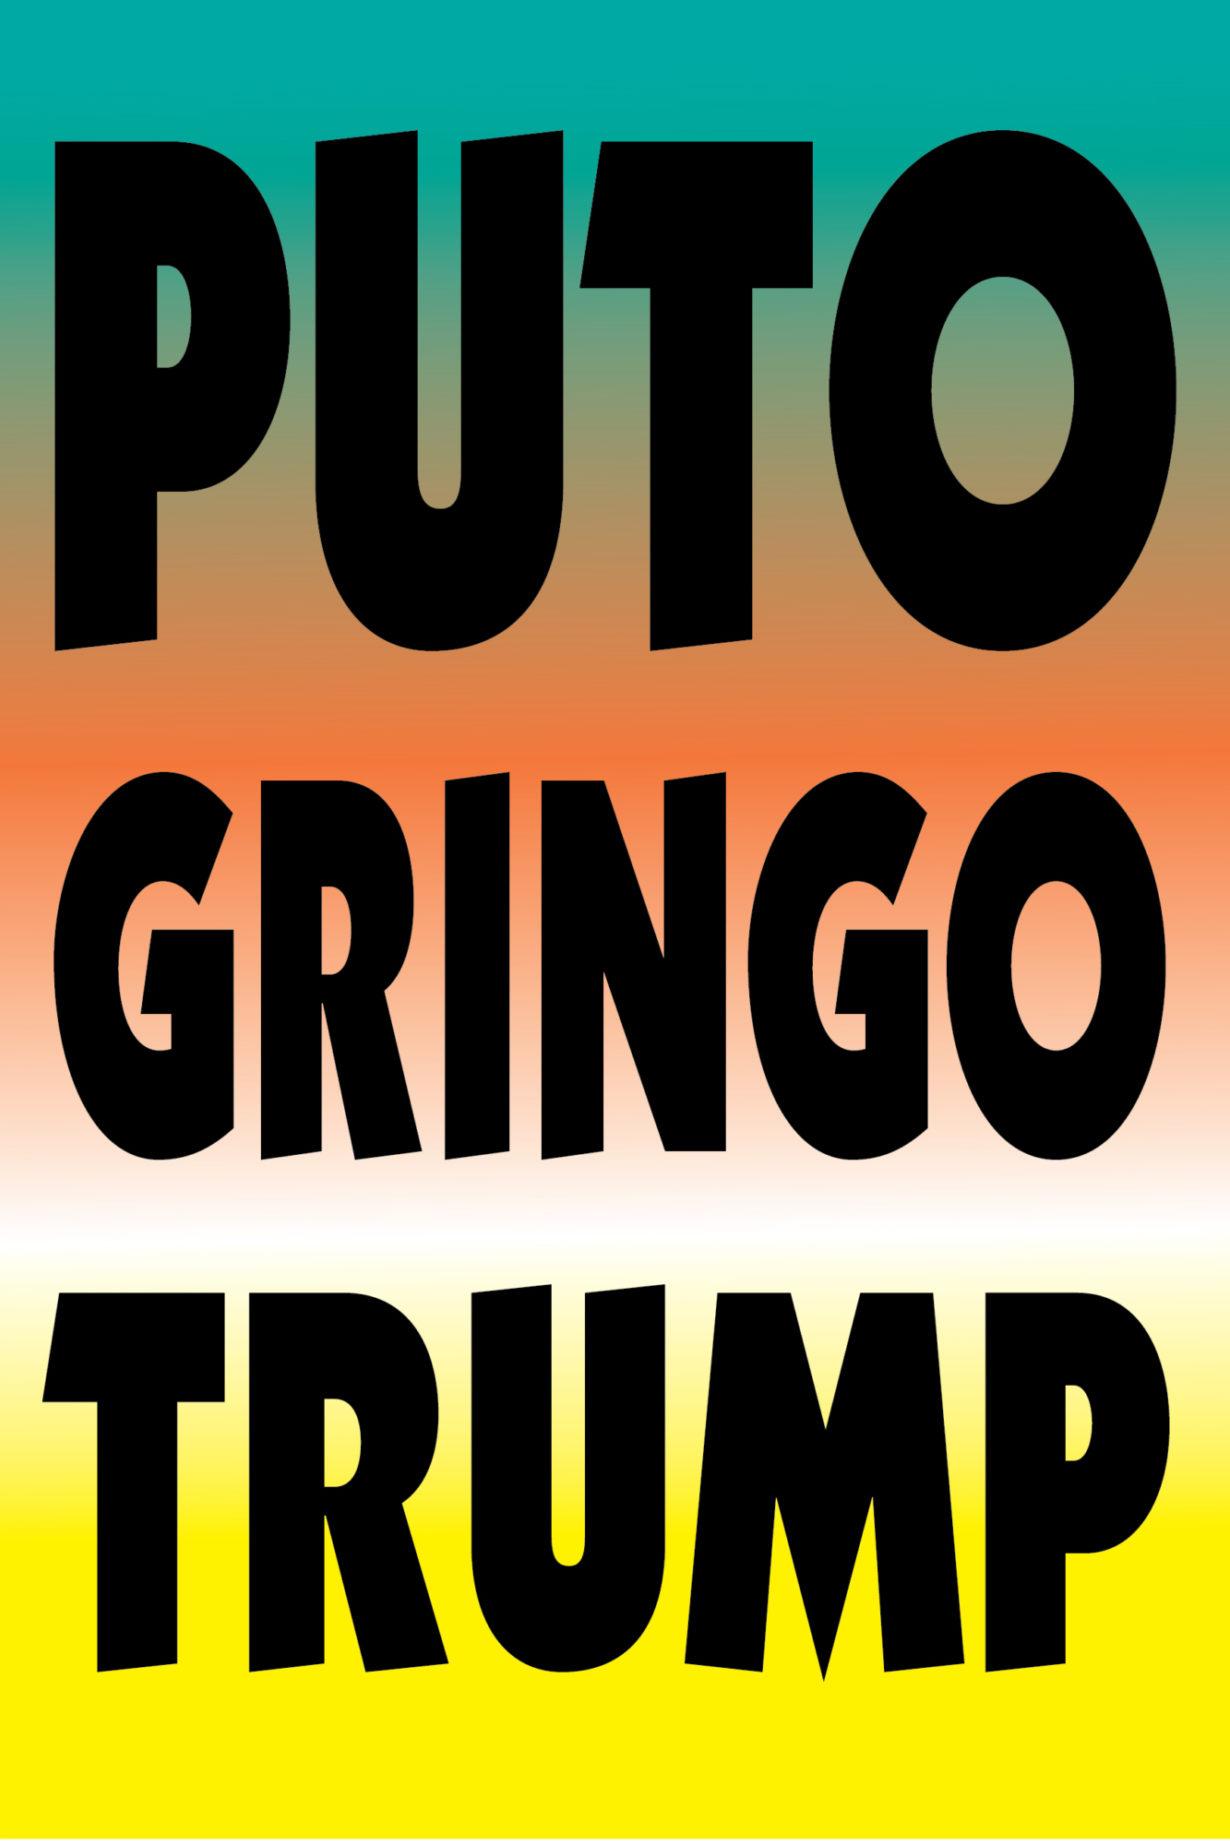 NP_51_75_2017_Puto-Gringo-Trump.jpg